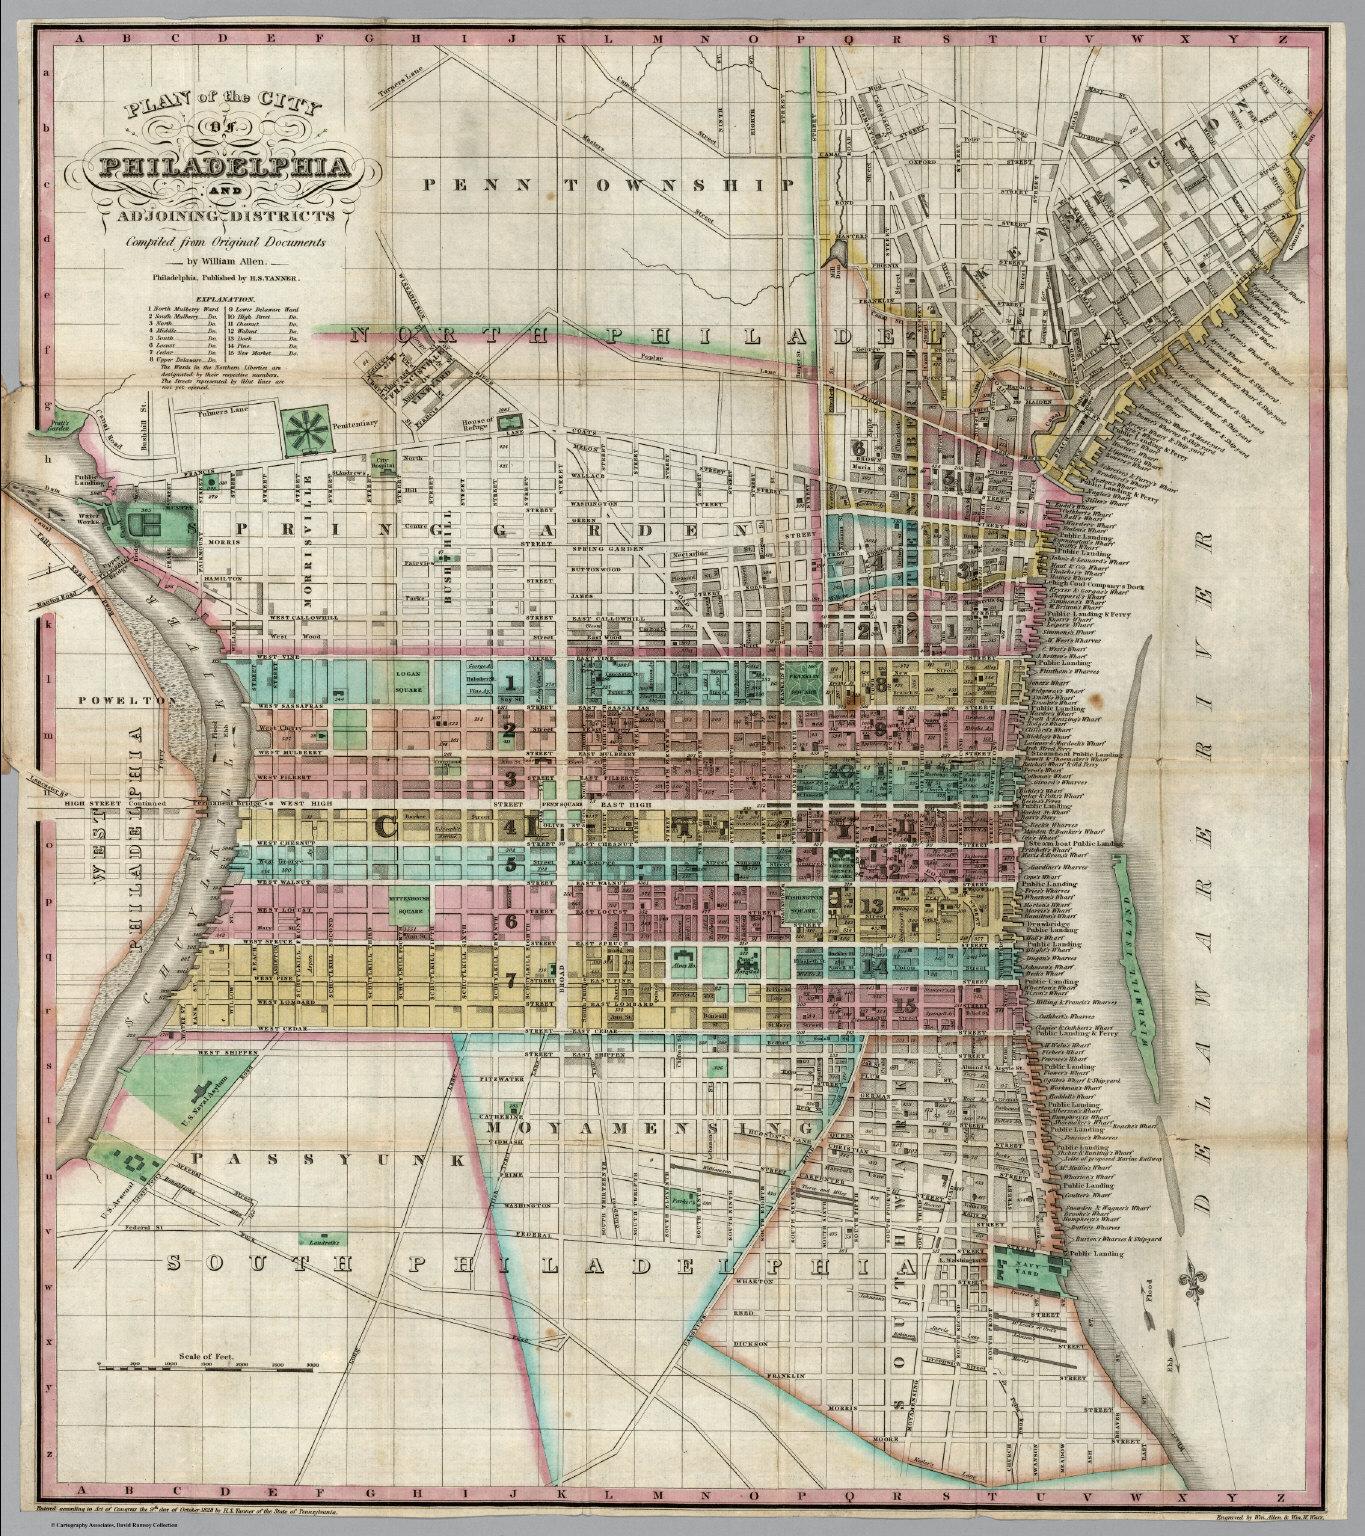 Plan Of The City Of Philadelphia David Rumsey Historical Map - Historic philadelphia map